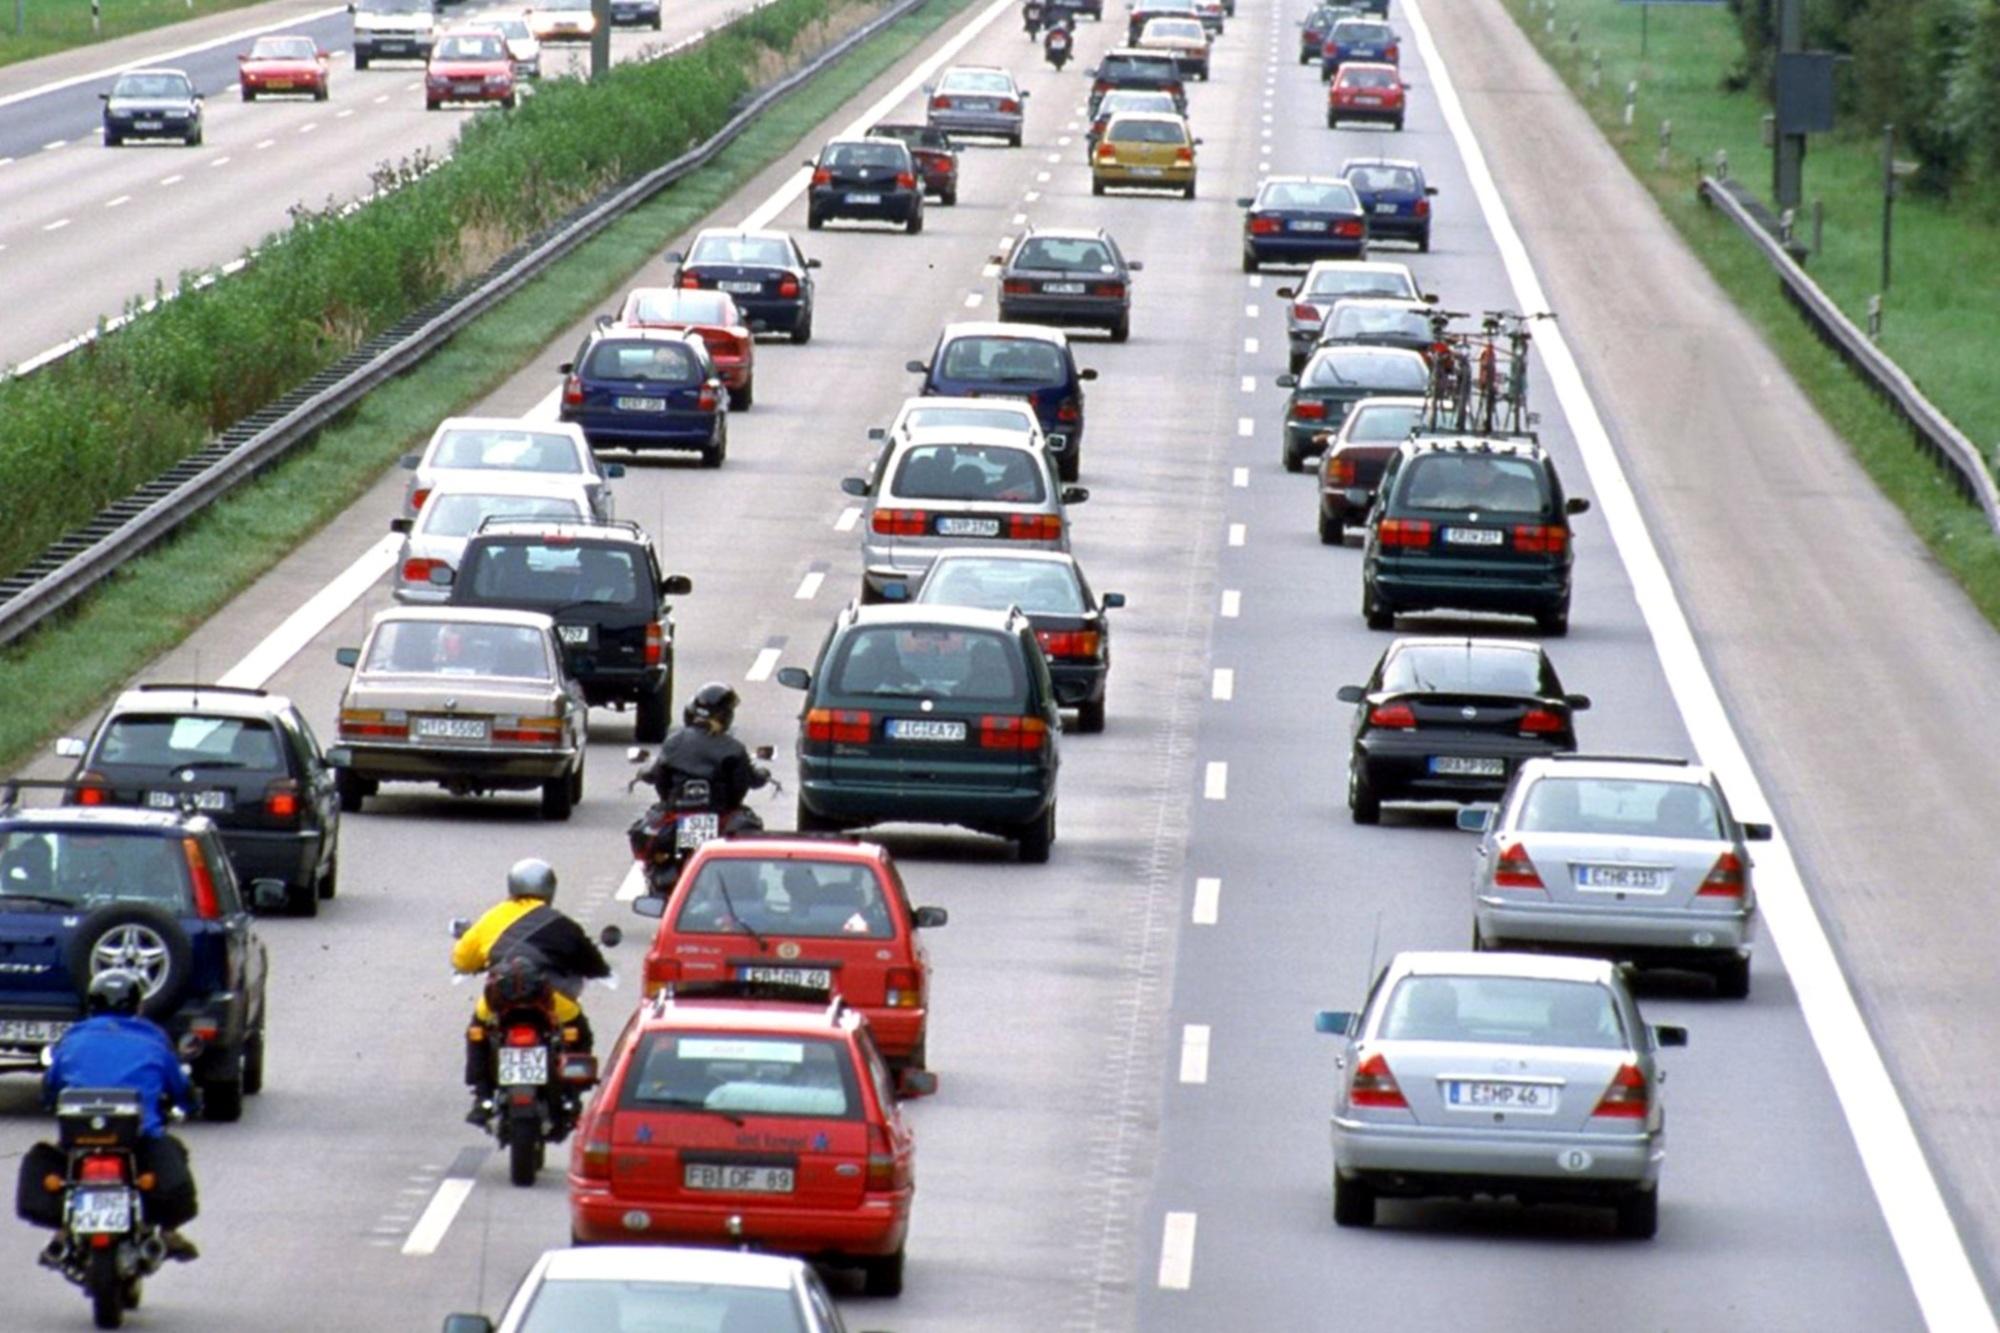 Pkw-Maut - Kleinwagen-Fahrer könnten sparen